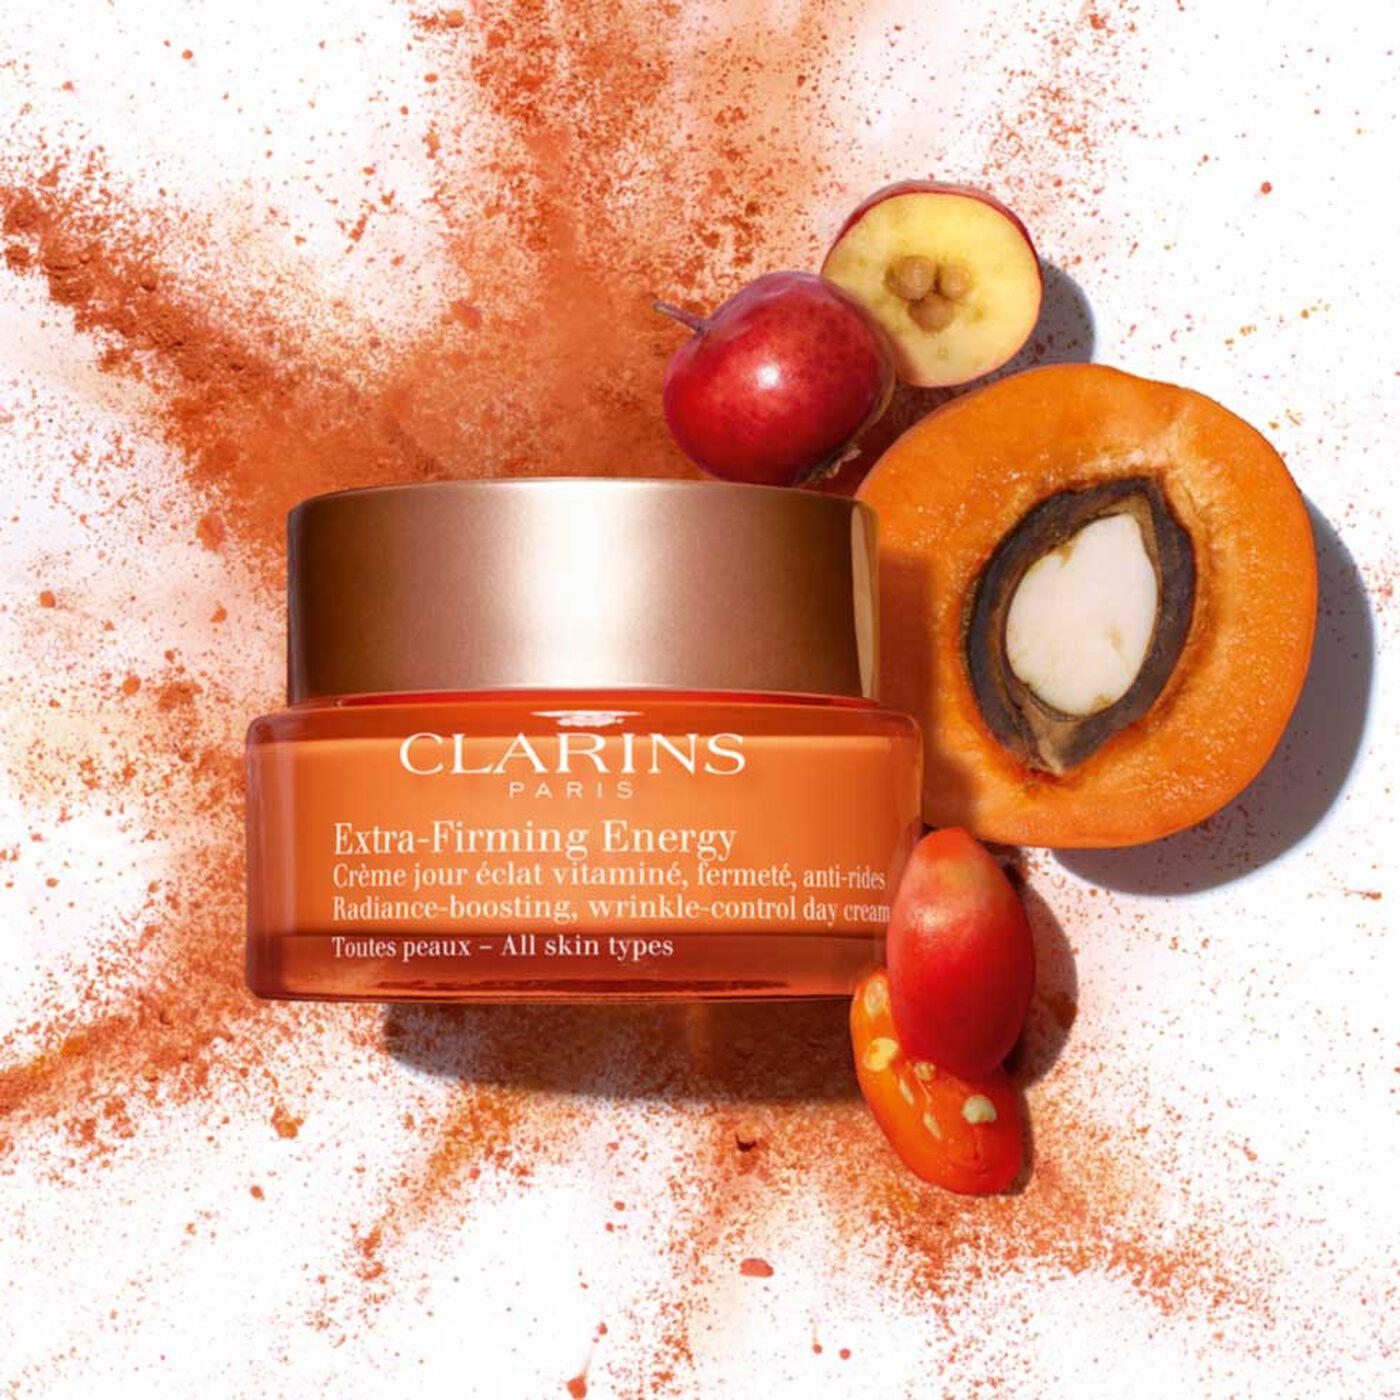 Extra-Firming Energy Anti-Age Tagescreme für jeden Hauttyp